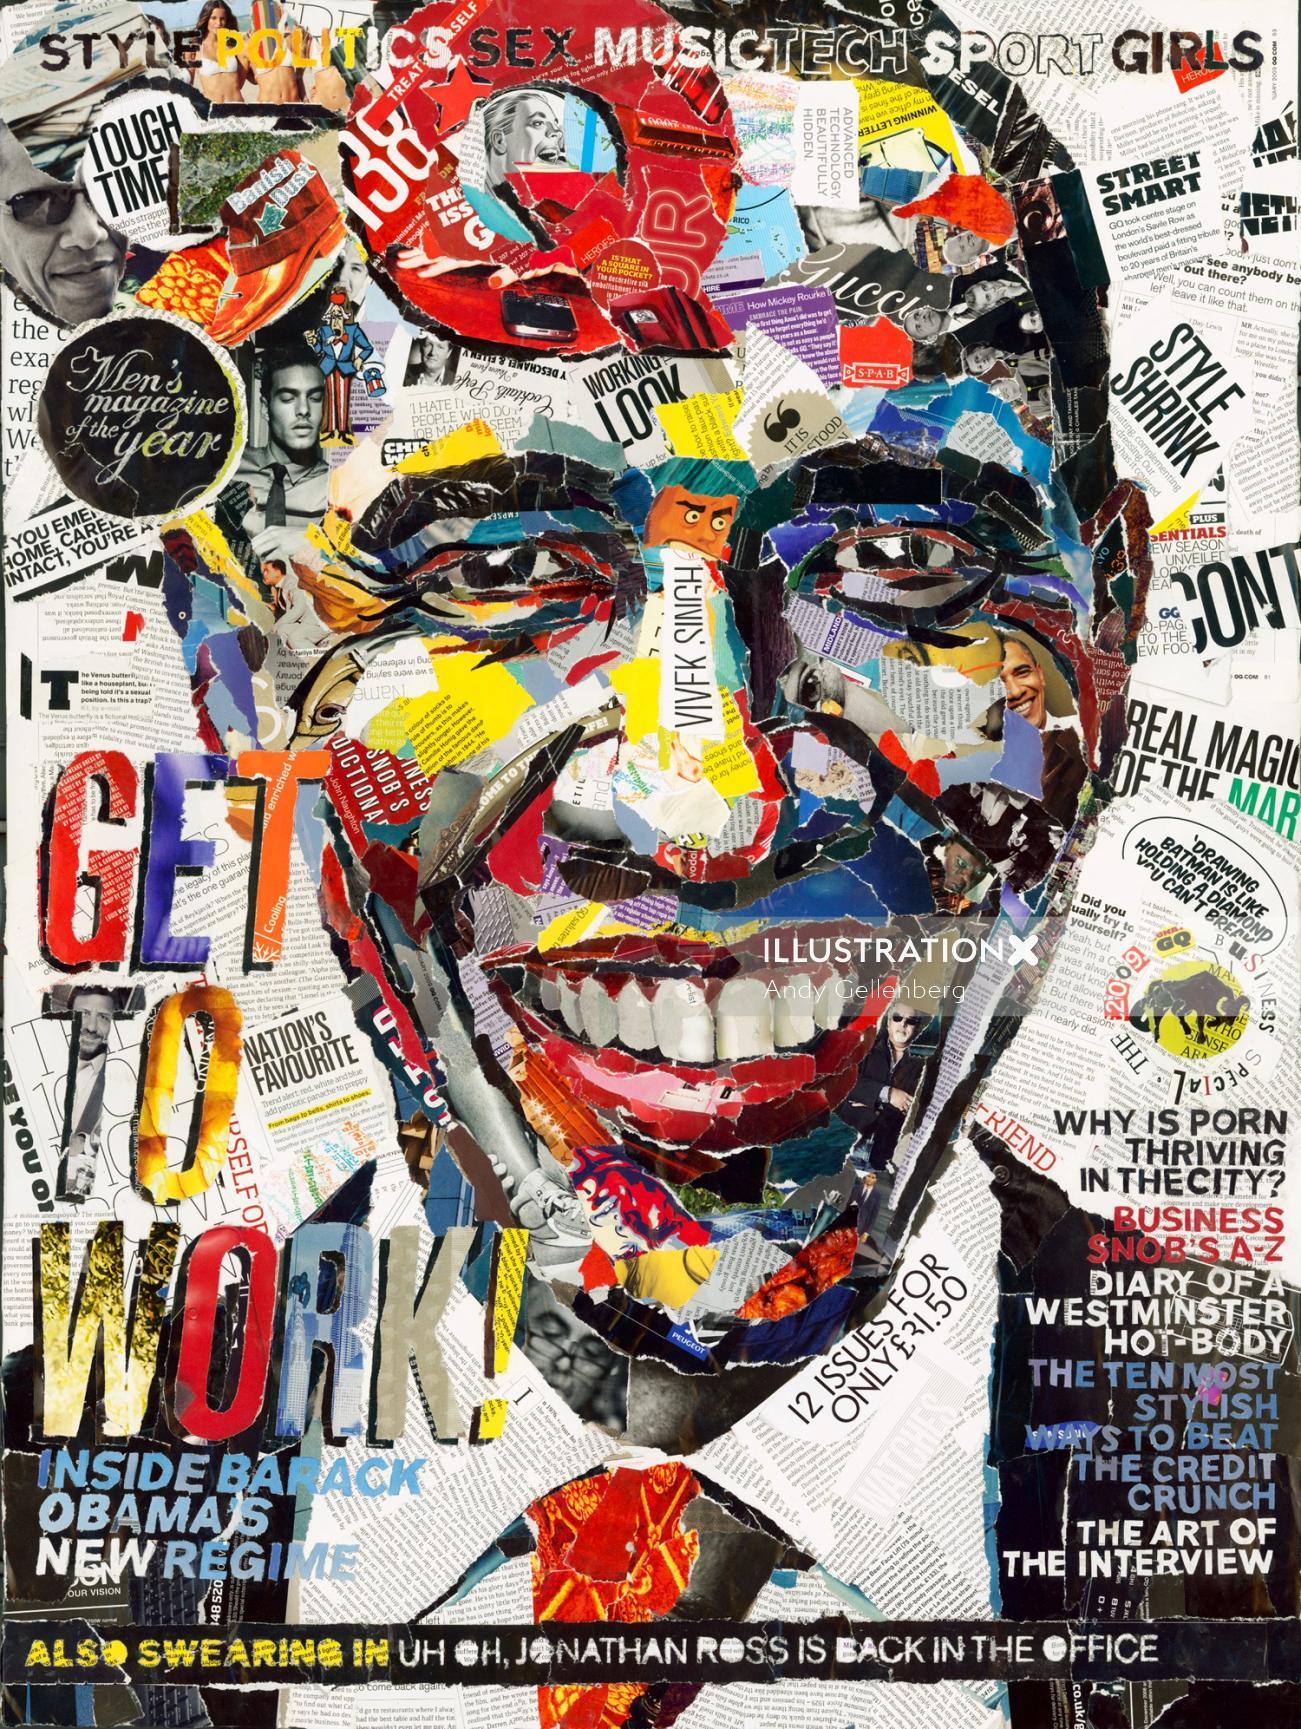 Paper art of Obama's portrait